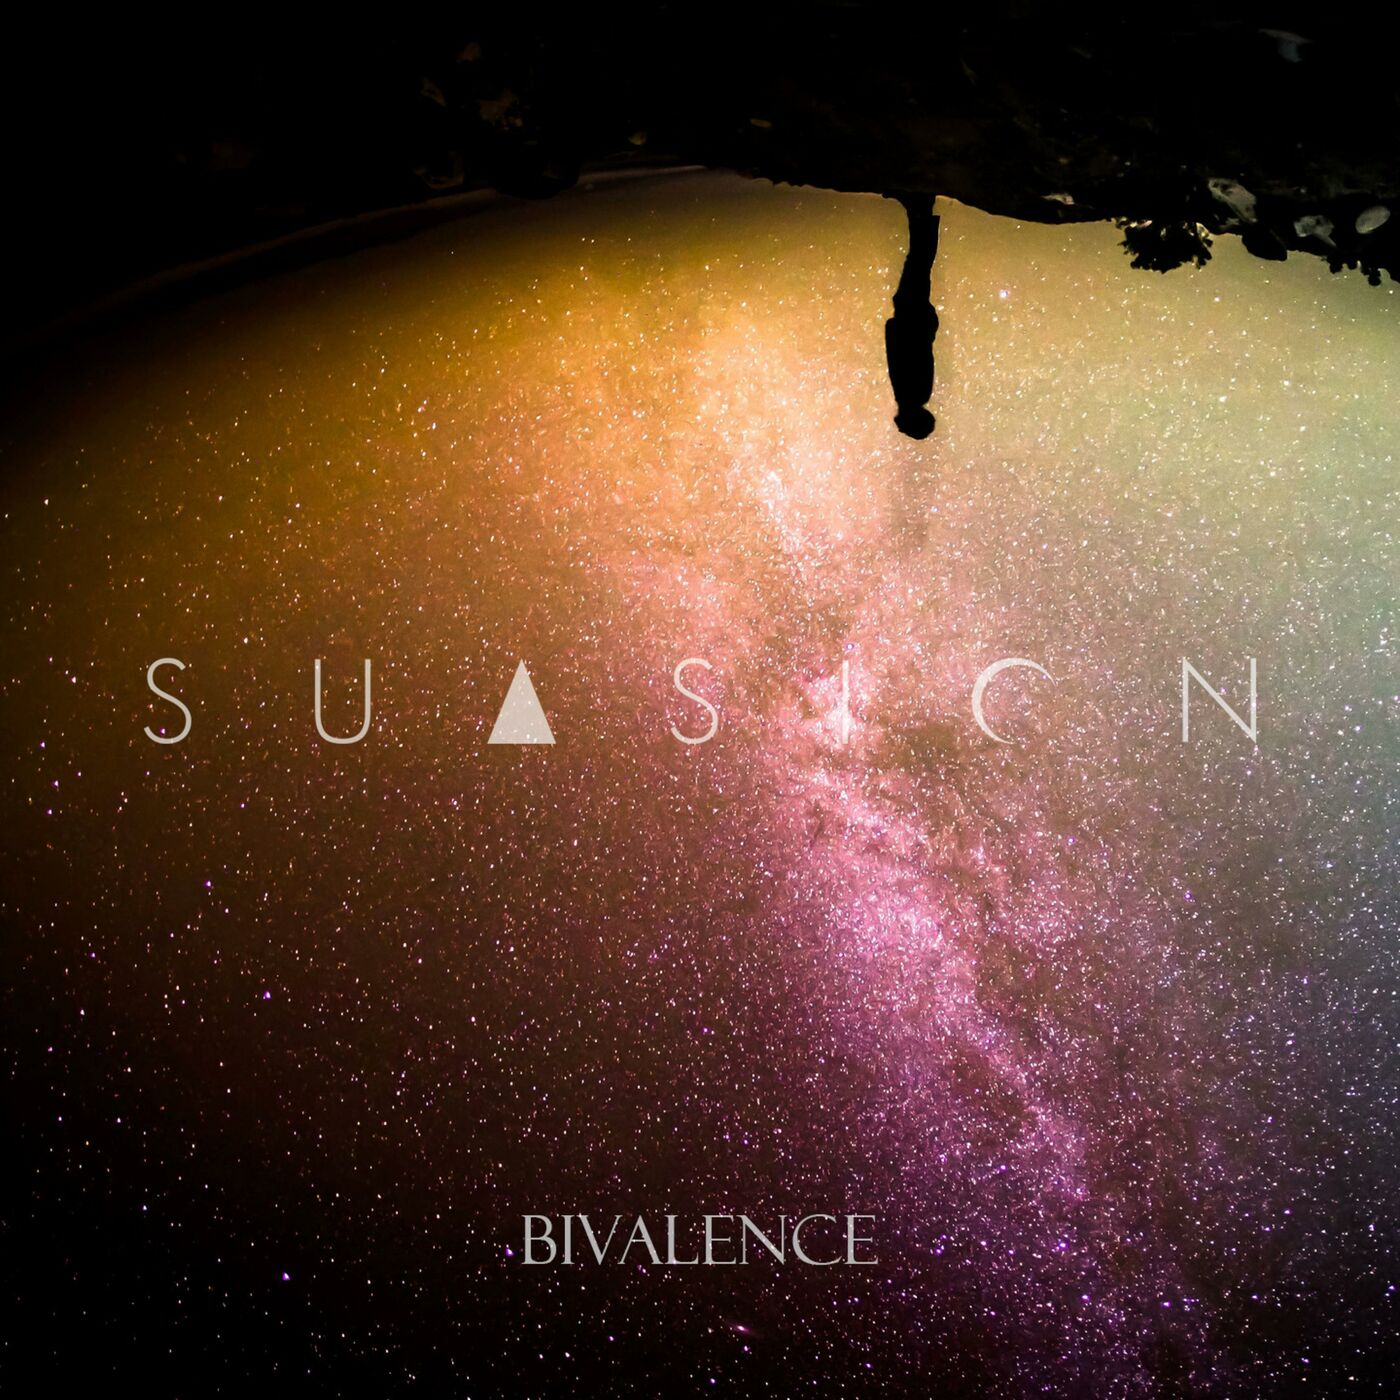 Suasion - Bivalence [single] (2016)